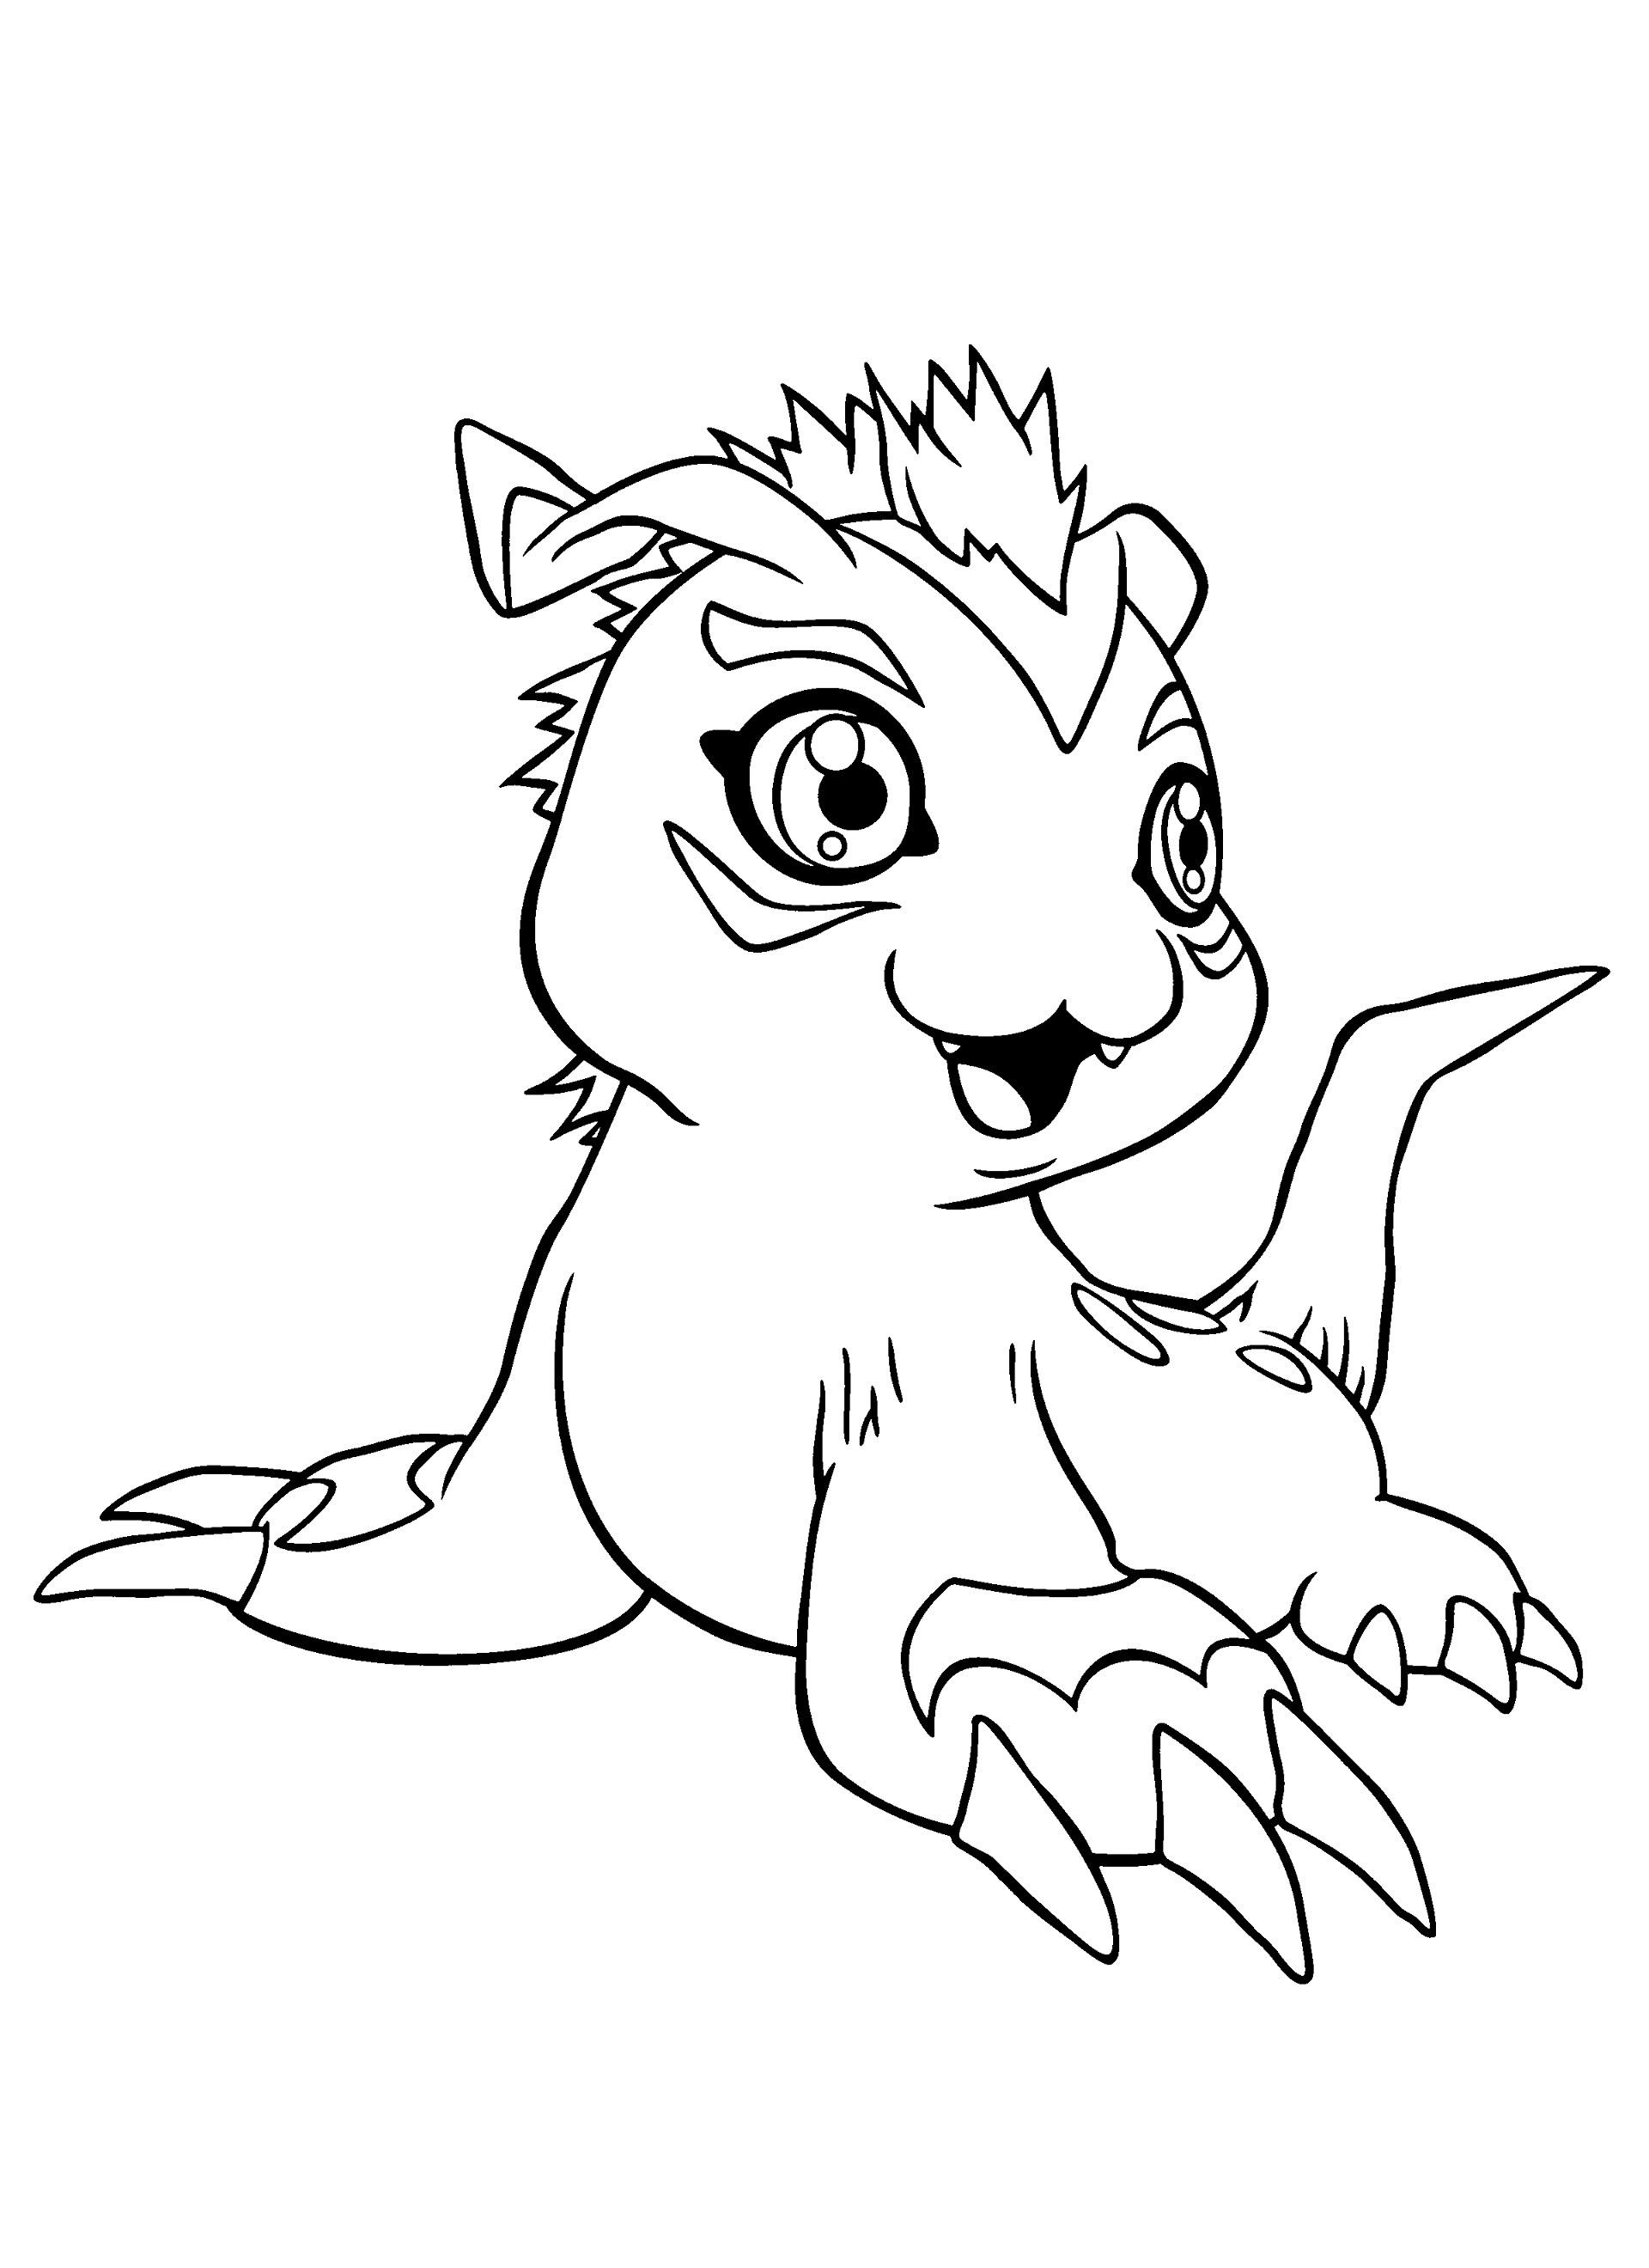 Digimon Coloring Pages  Dibujos de Digimon para colorear pintar e imprimir gratis